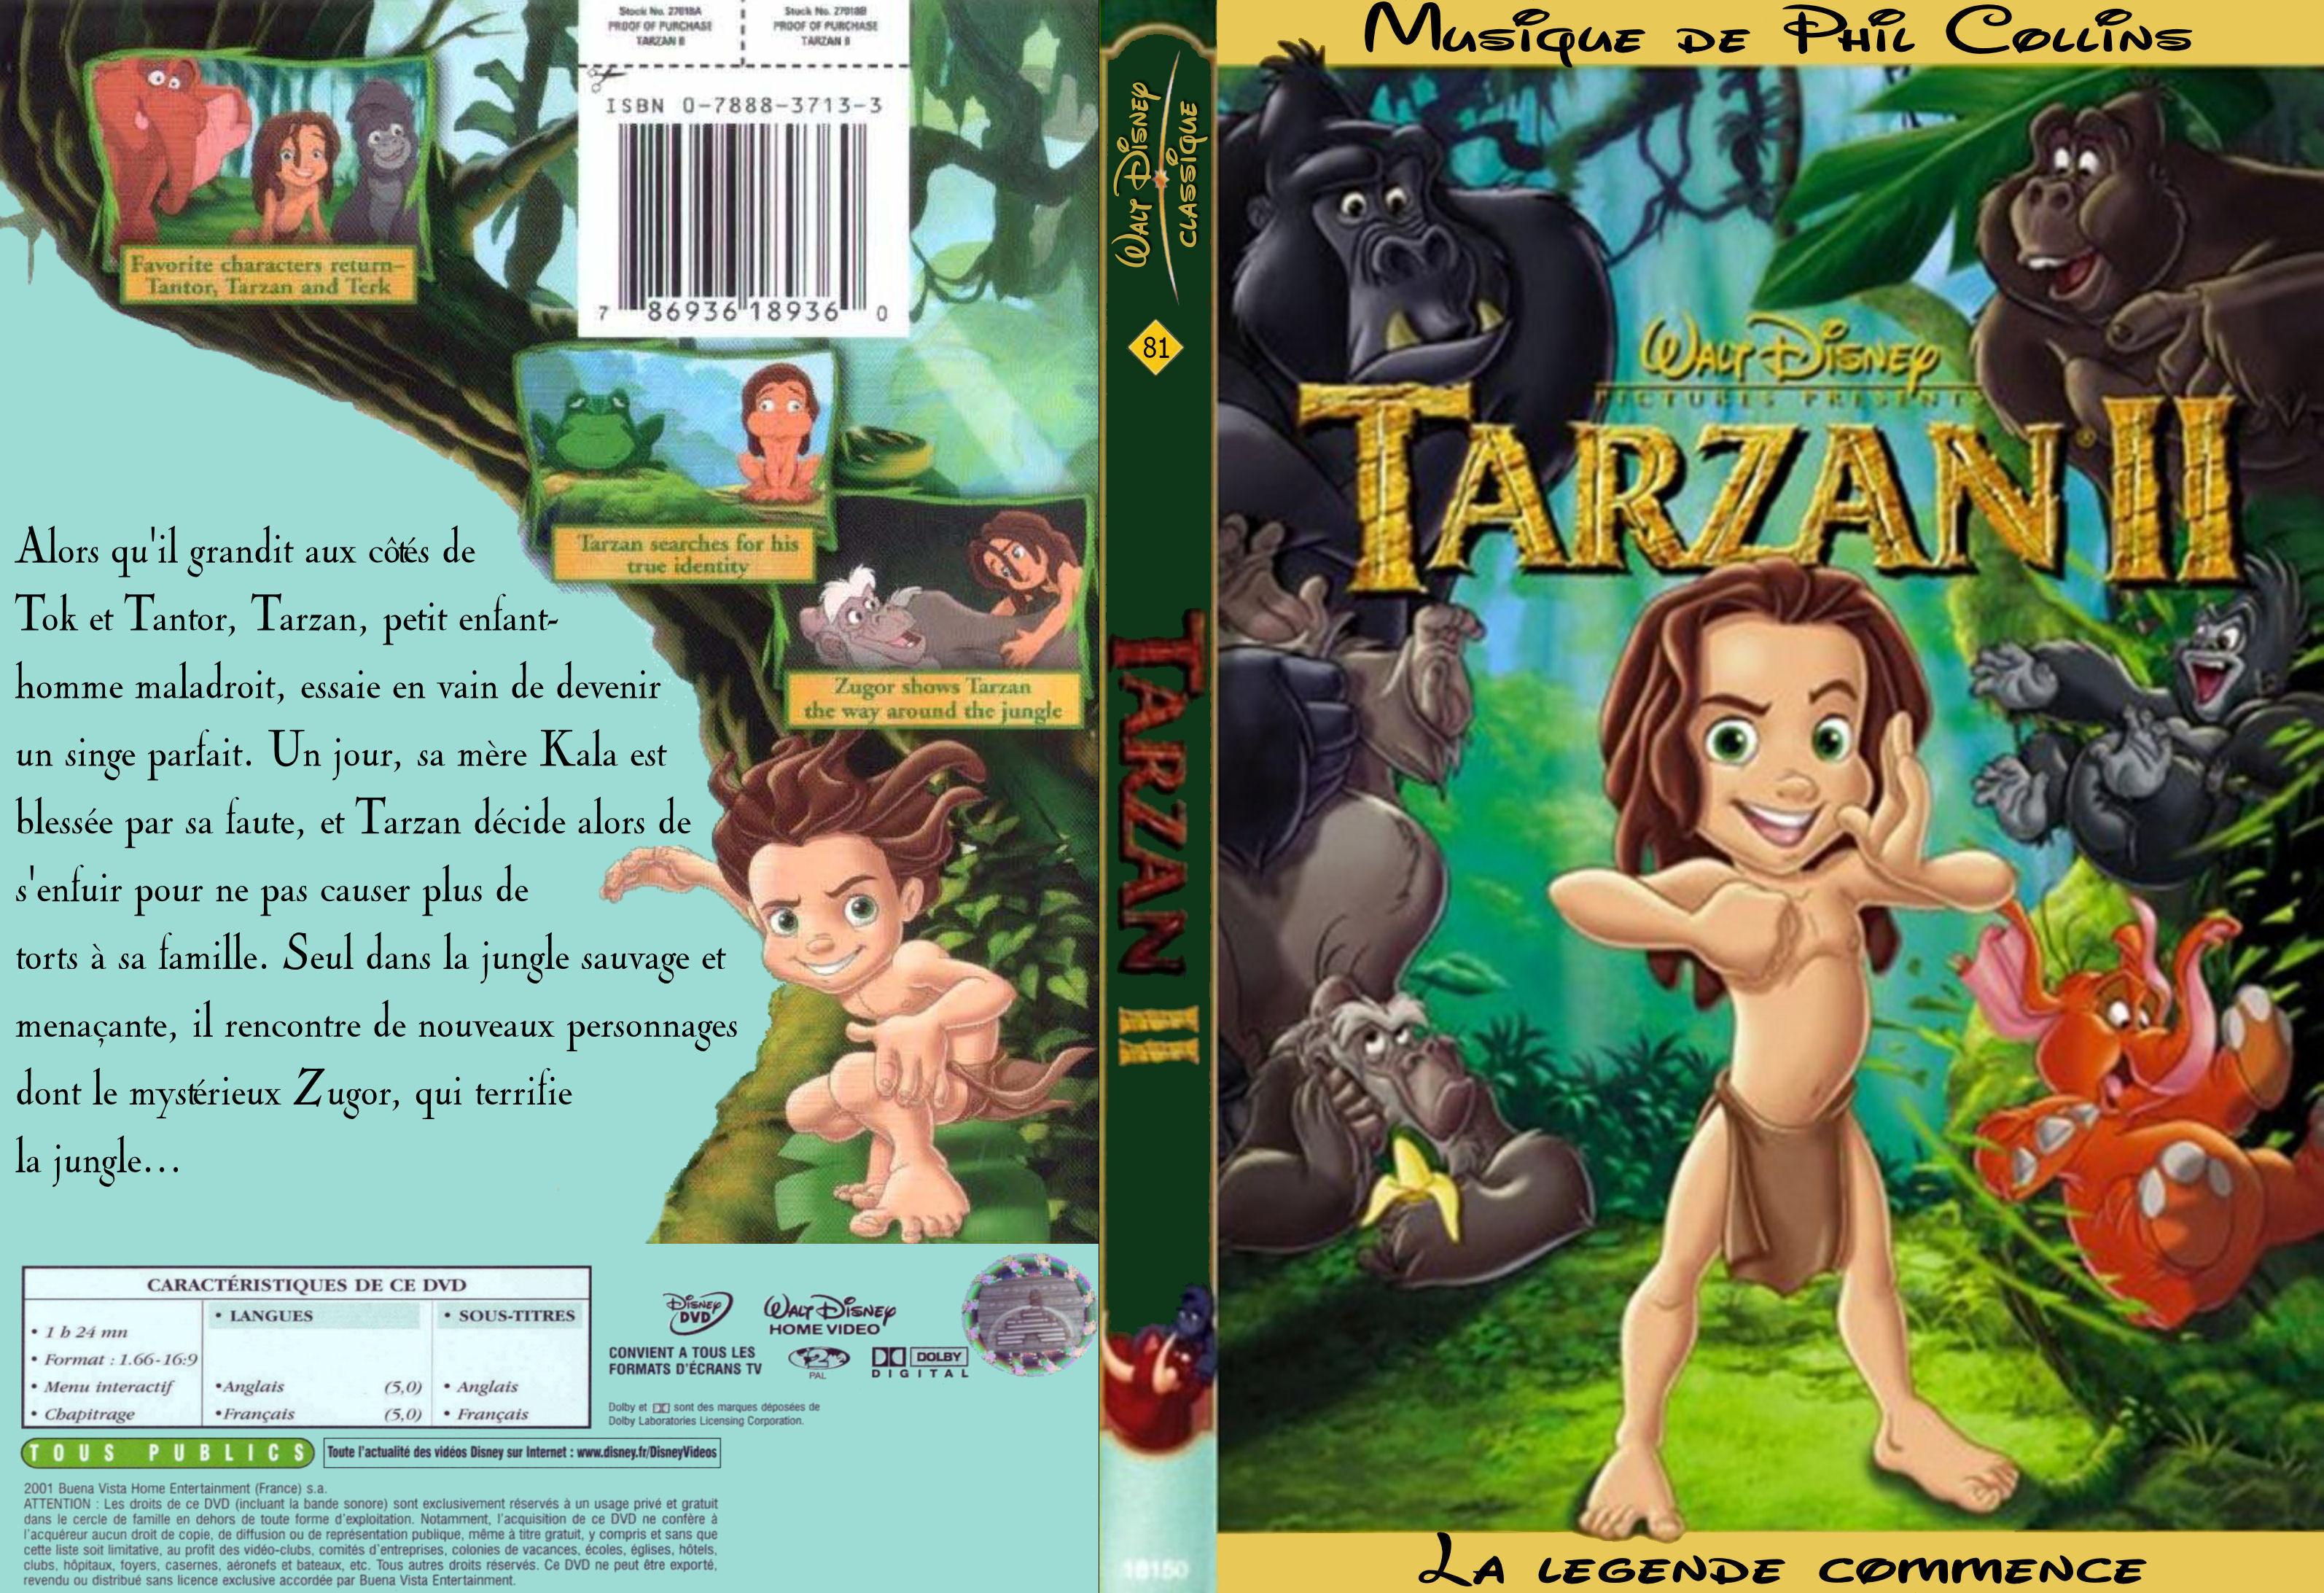 Tarzan 2 Dvd Dvd Cover Tarzan 2